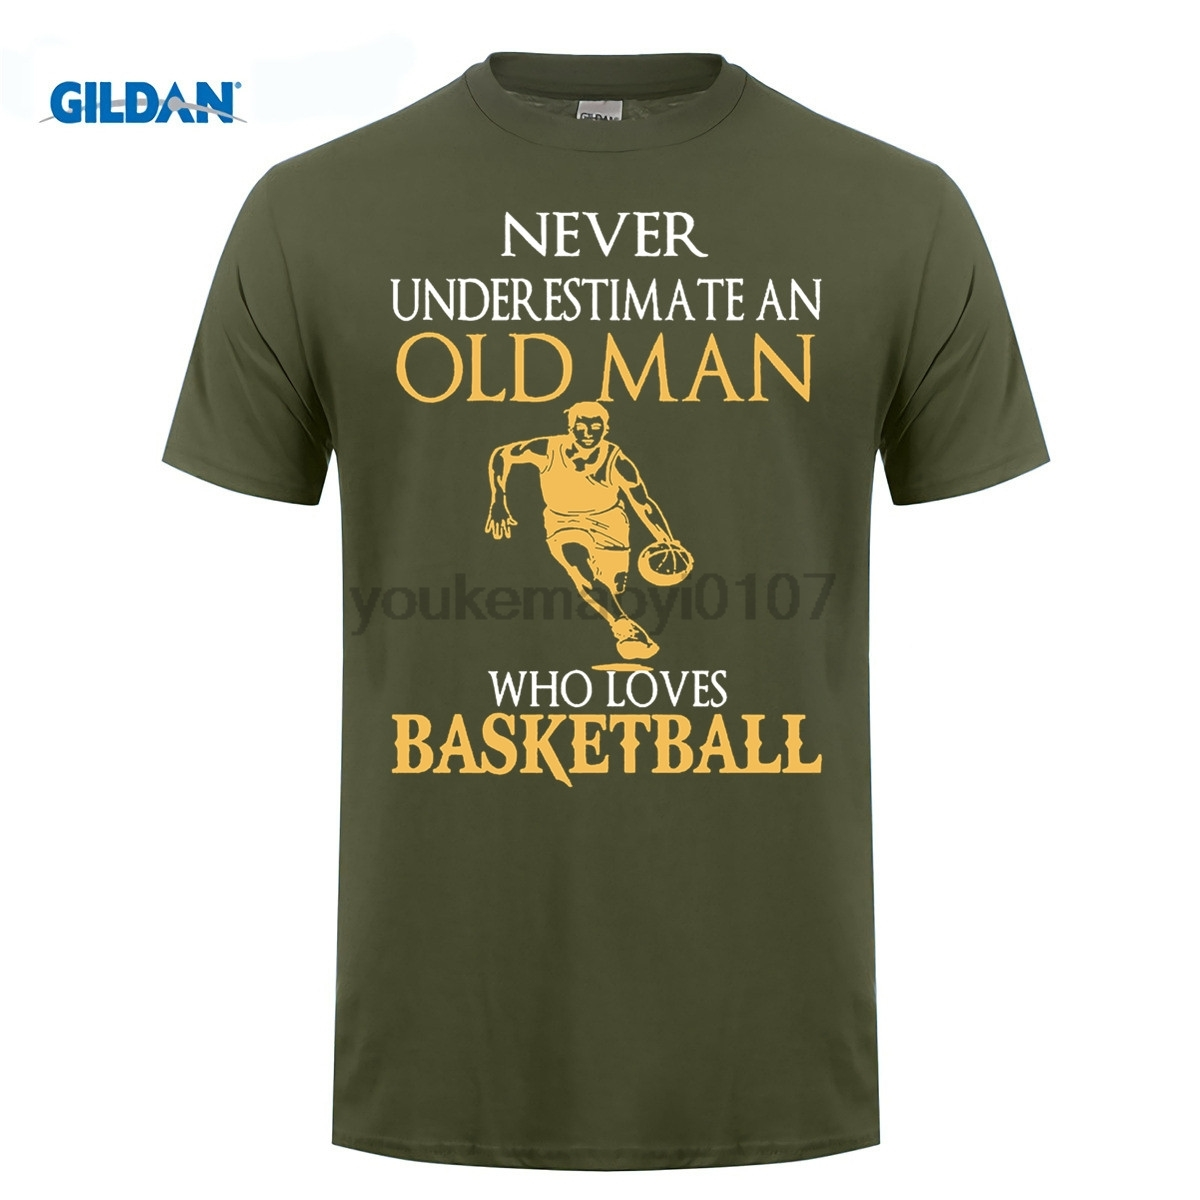 GILDAN  Fashion Short Gildan Crew Neck Never Underestimate An Old Man Basketballer T Shirts